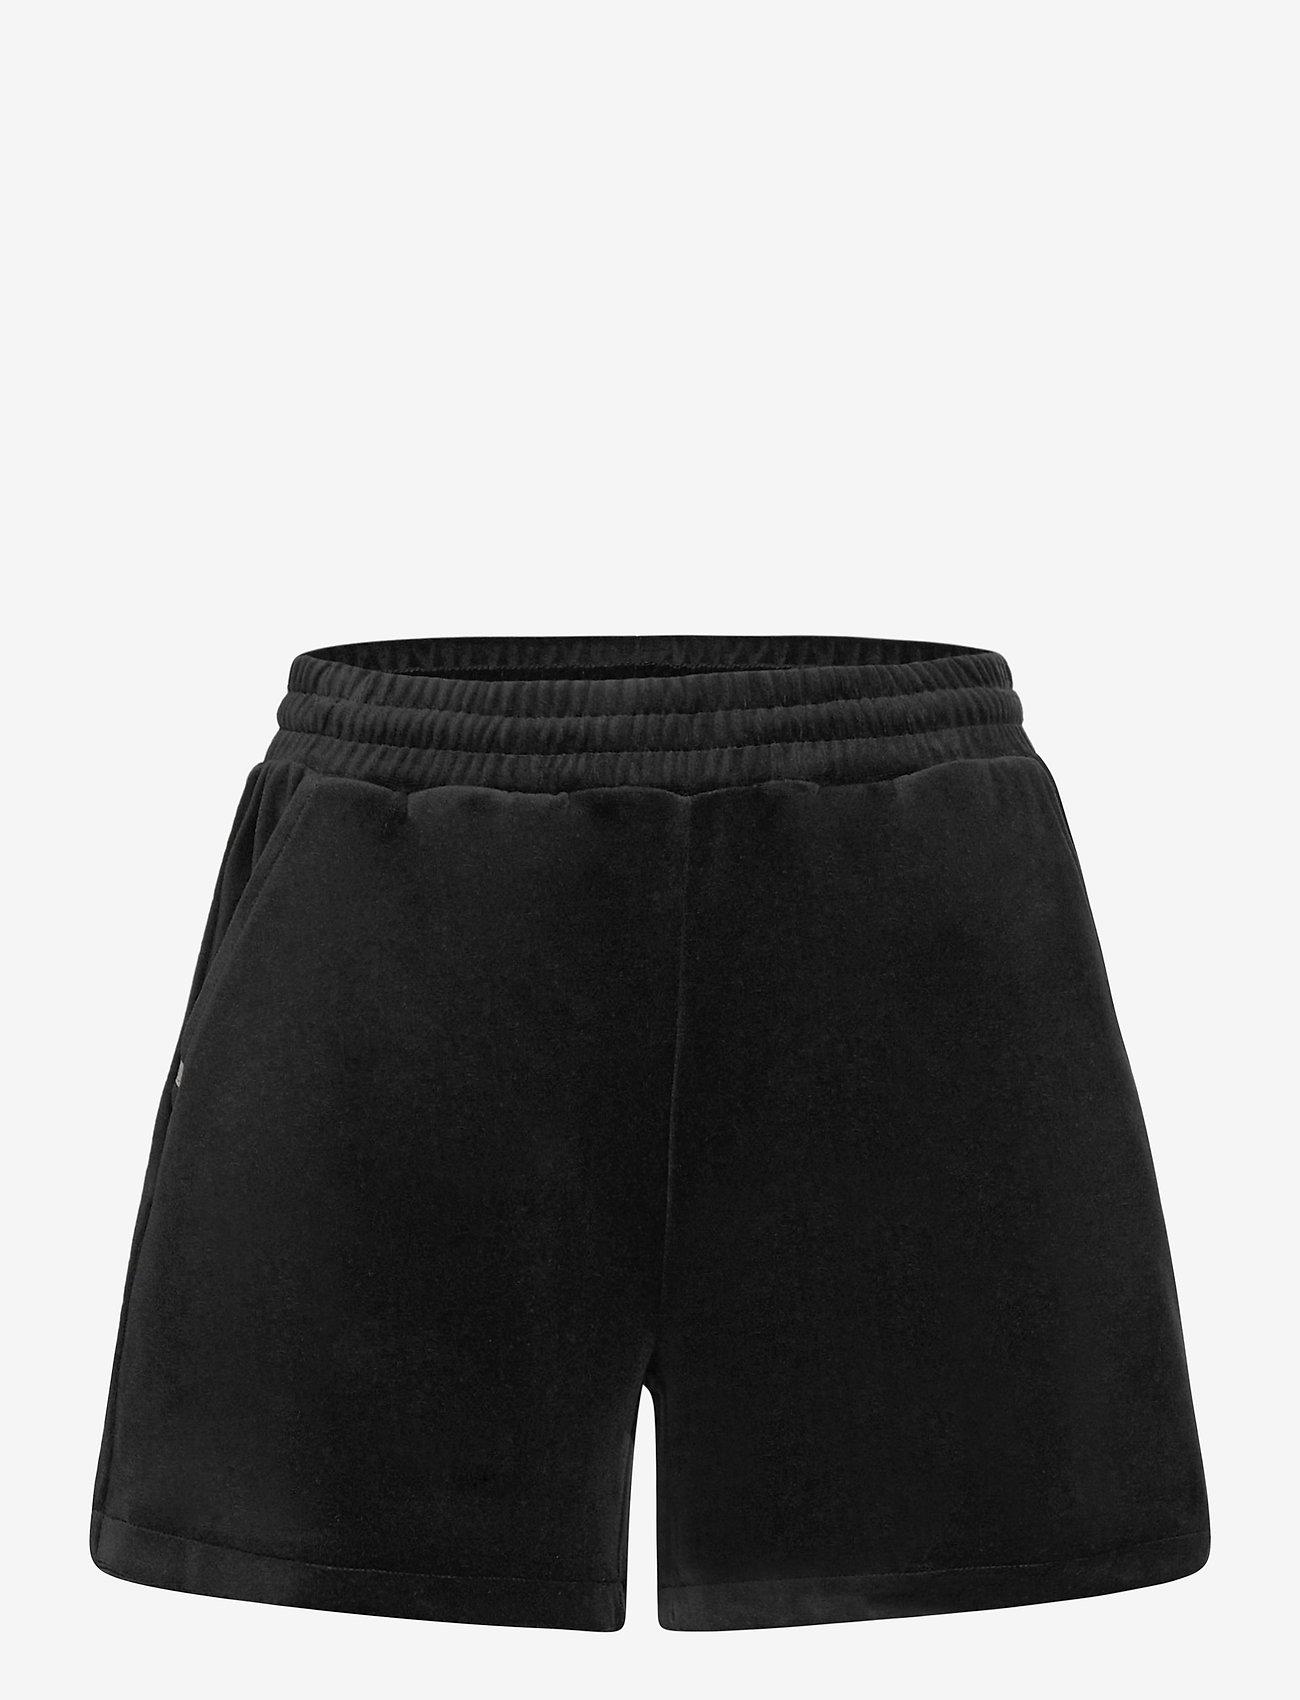 Rosemunde - Shorts - casual shorts - black - 0